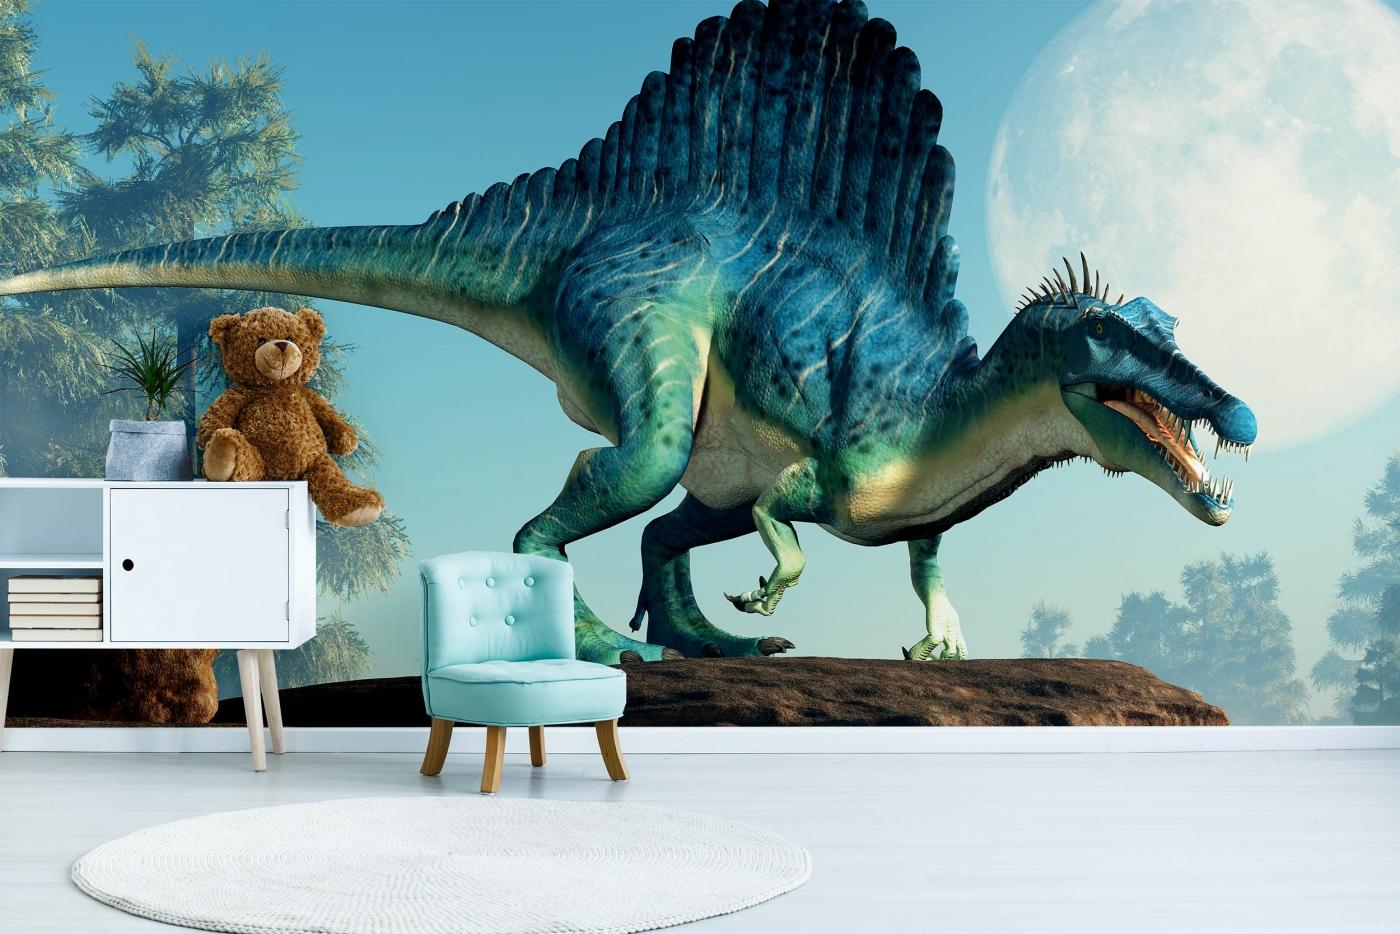 Tapeta Dinosaurus, 144 x 105 cm